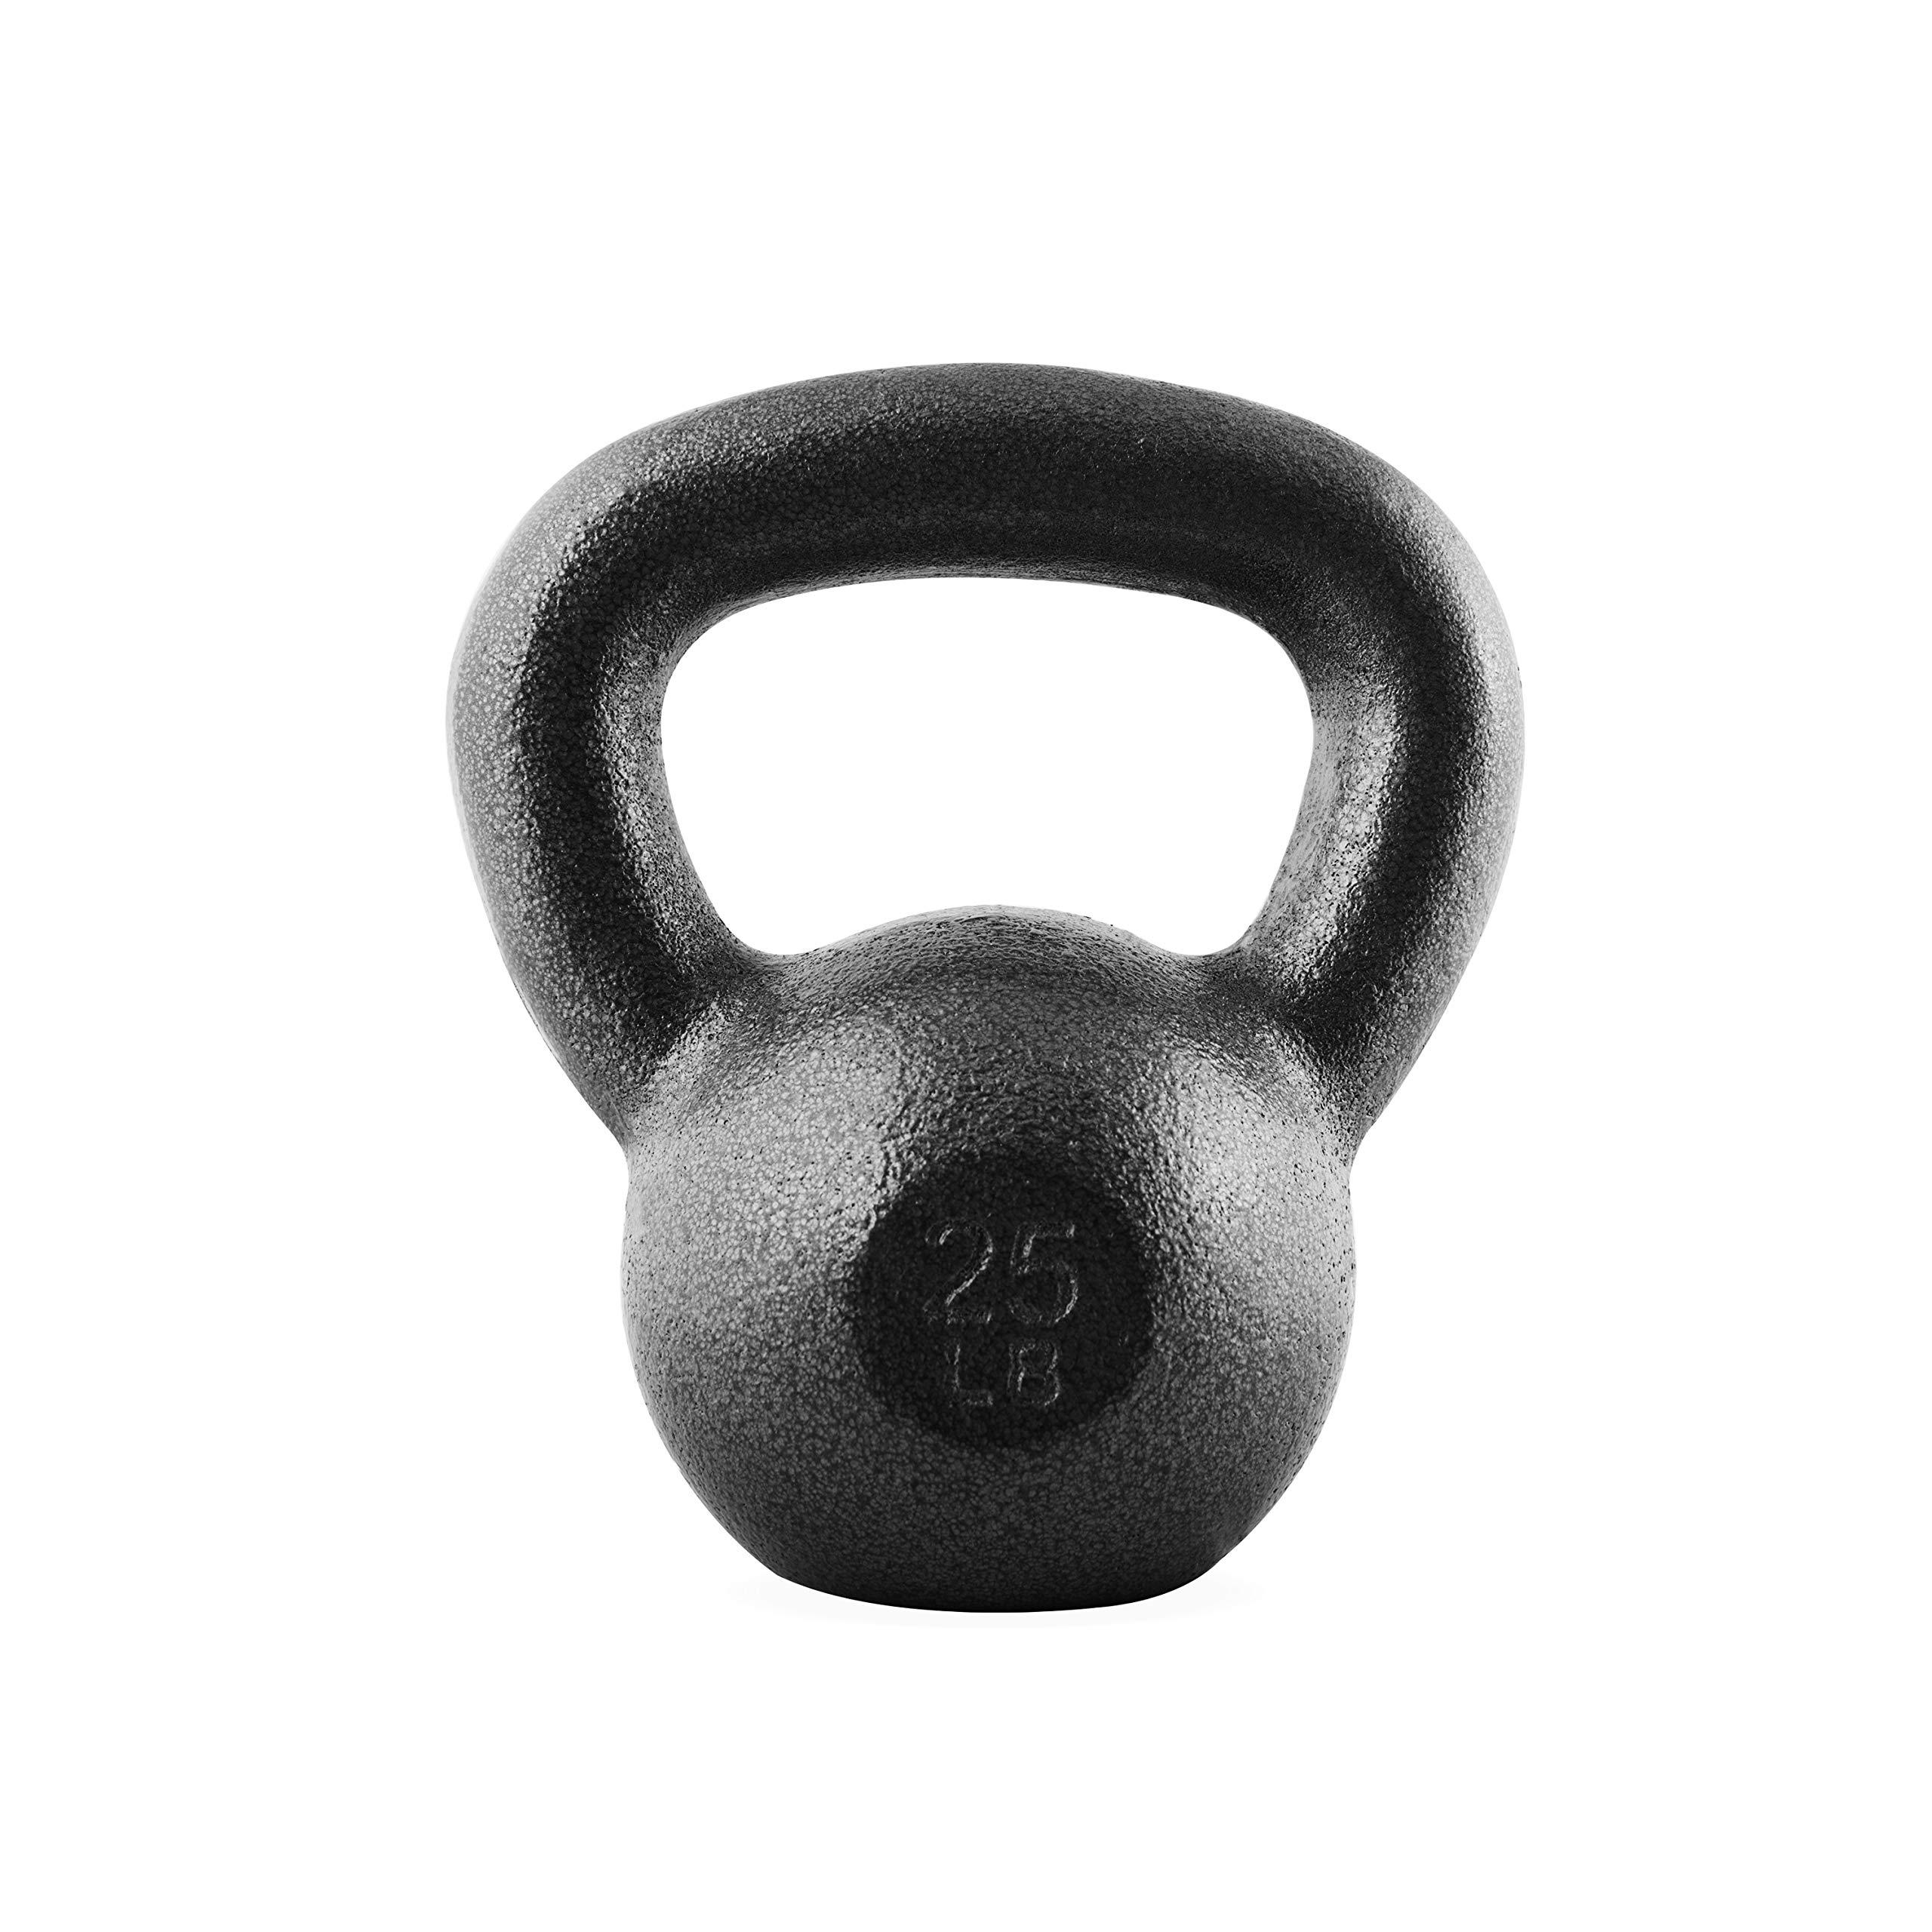 CAP Barbell SDK2B-025 Cast Iron Kettlebell, 25 lb, Black